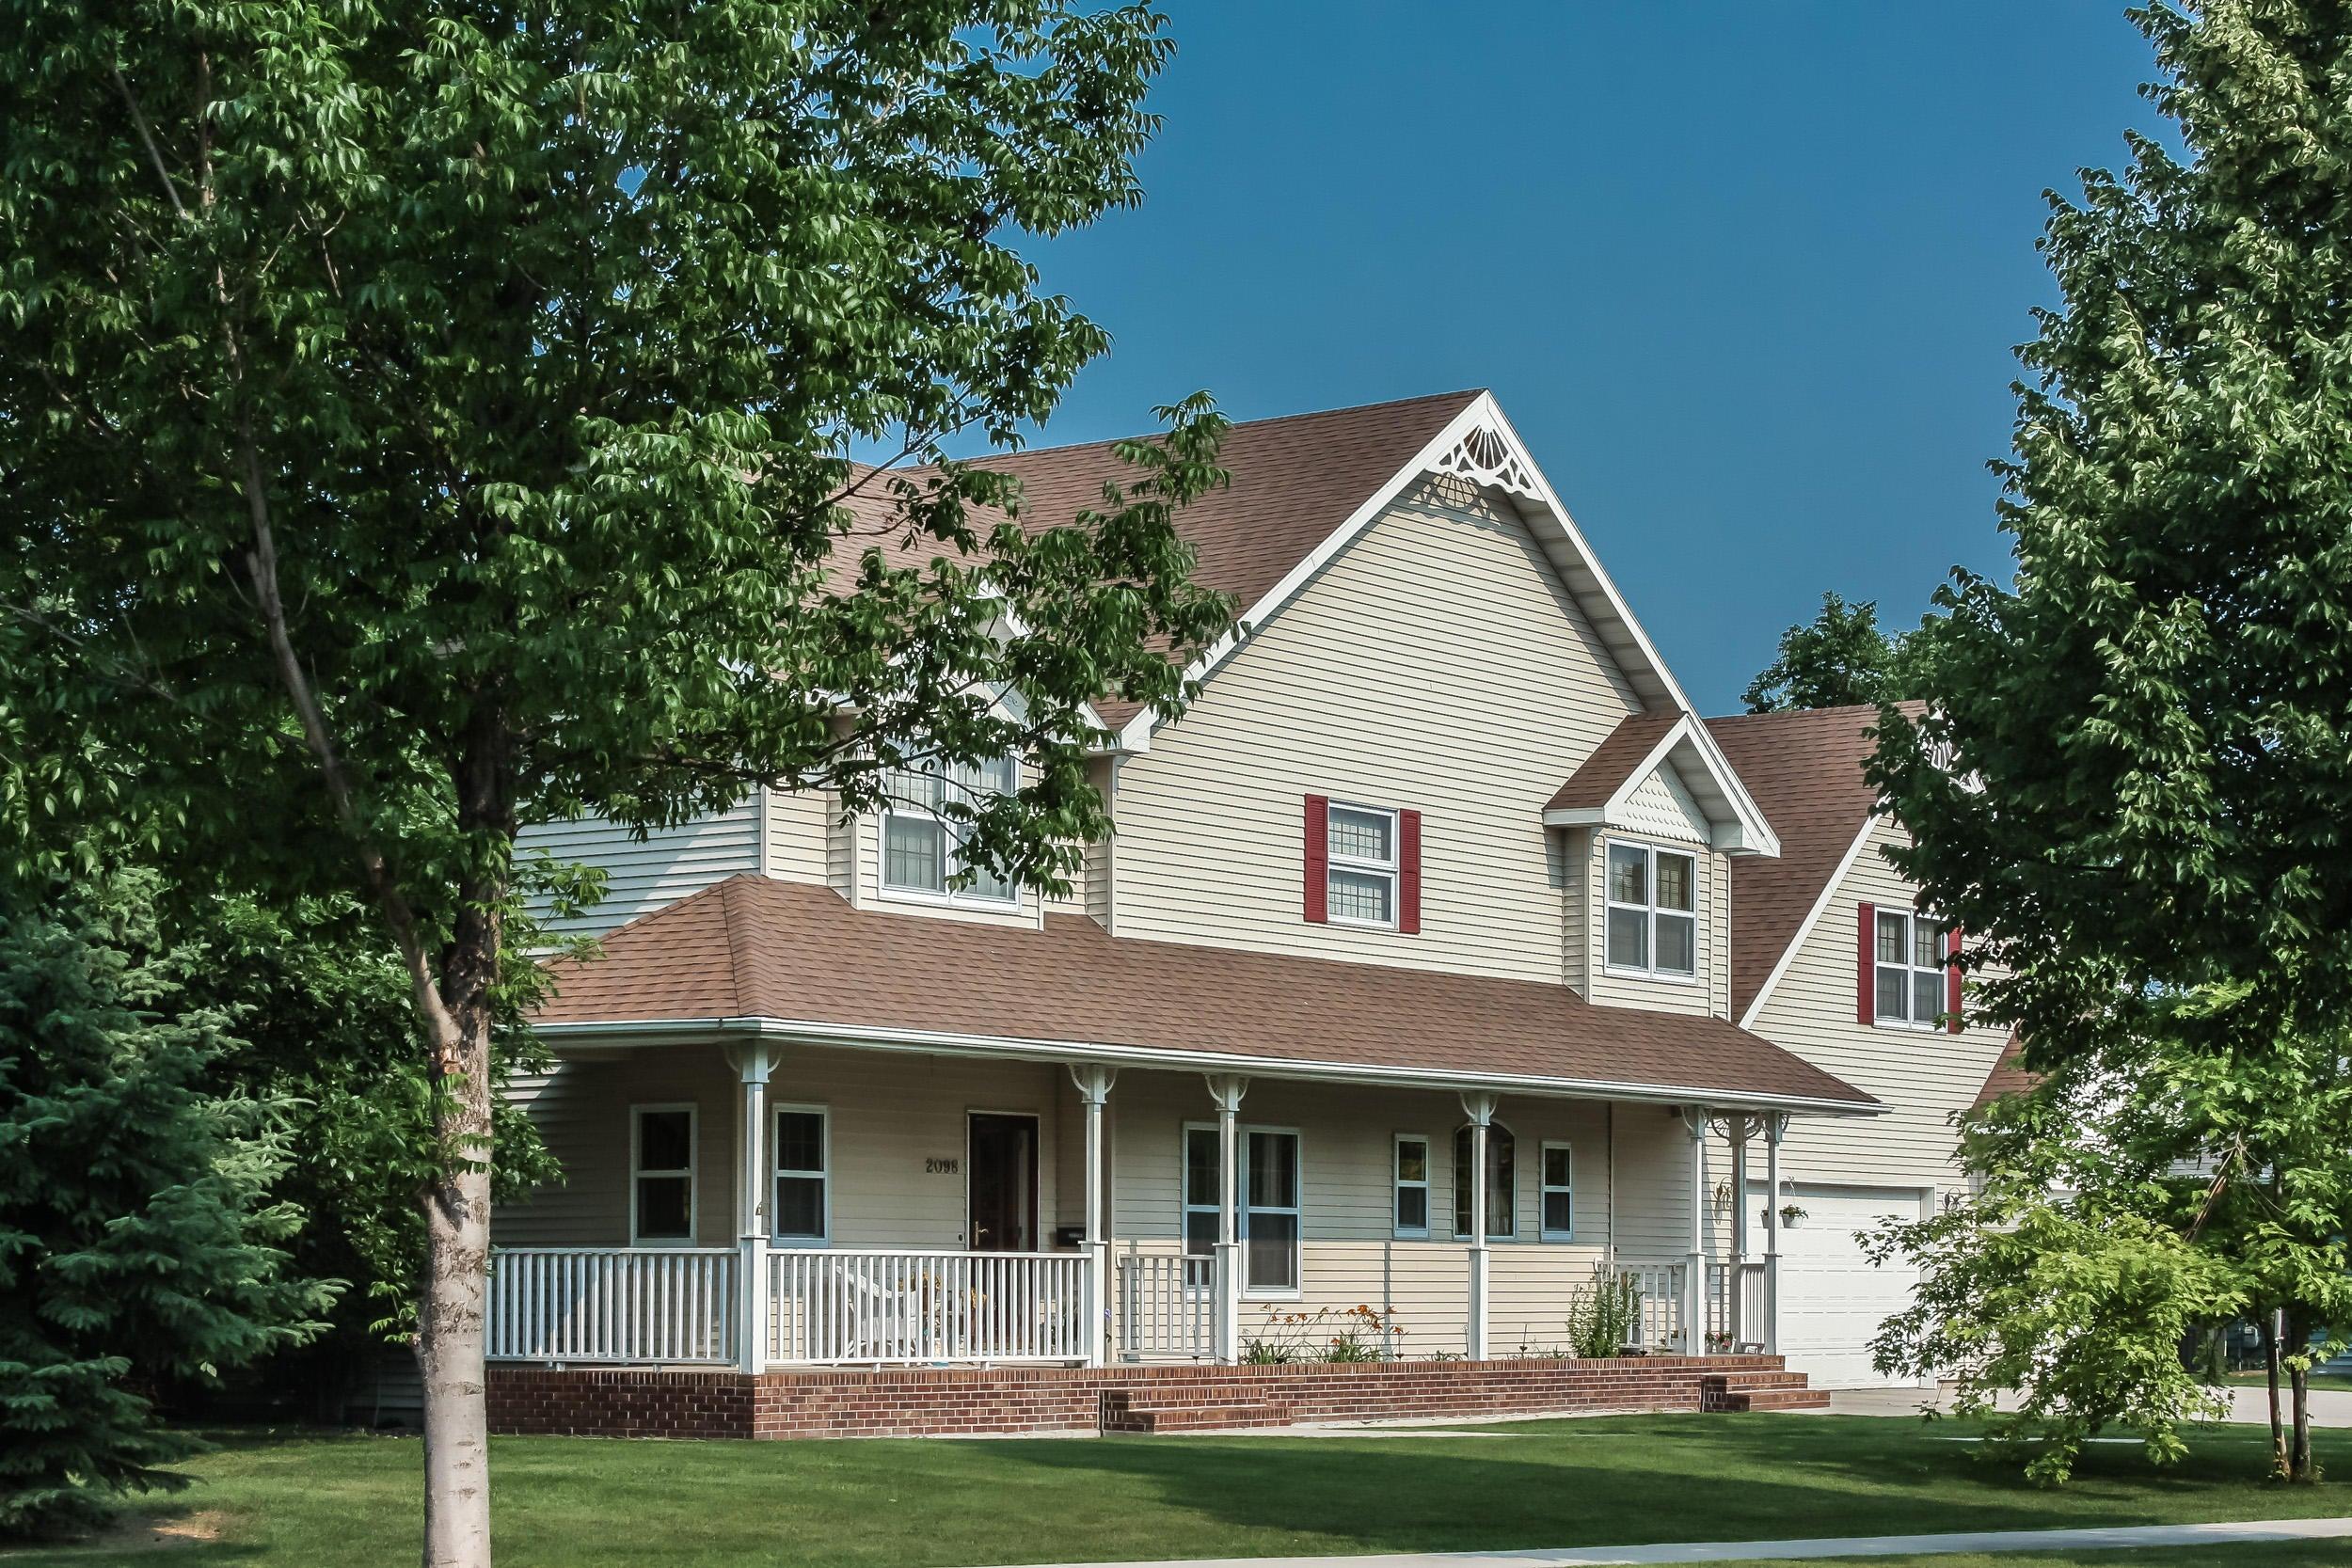 2098 38TH ST,GRAND FORKS,North Dakota 58201,4 Bedrooms Bedrooms,3 BathroomsBathrooms,Single Family,38TH ST,16-367